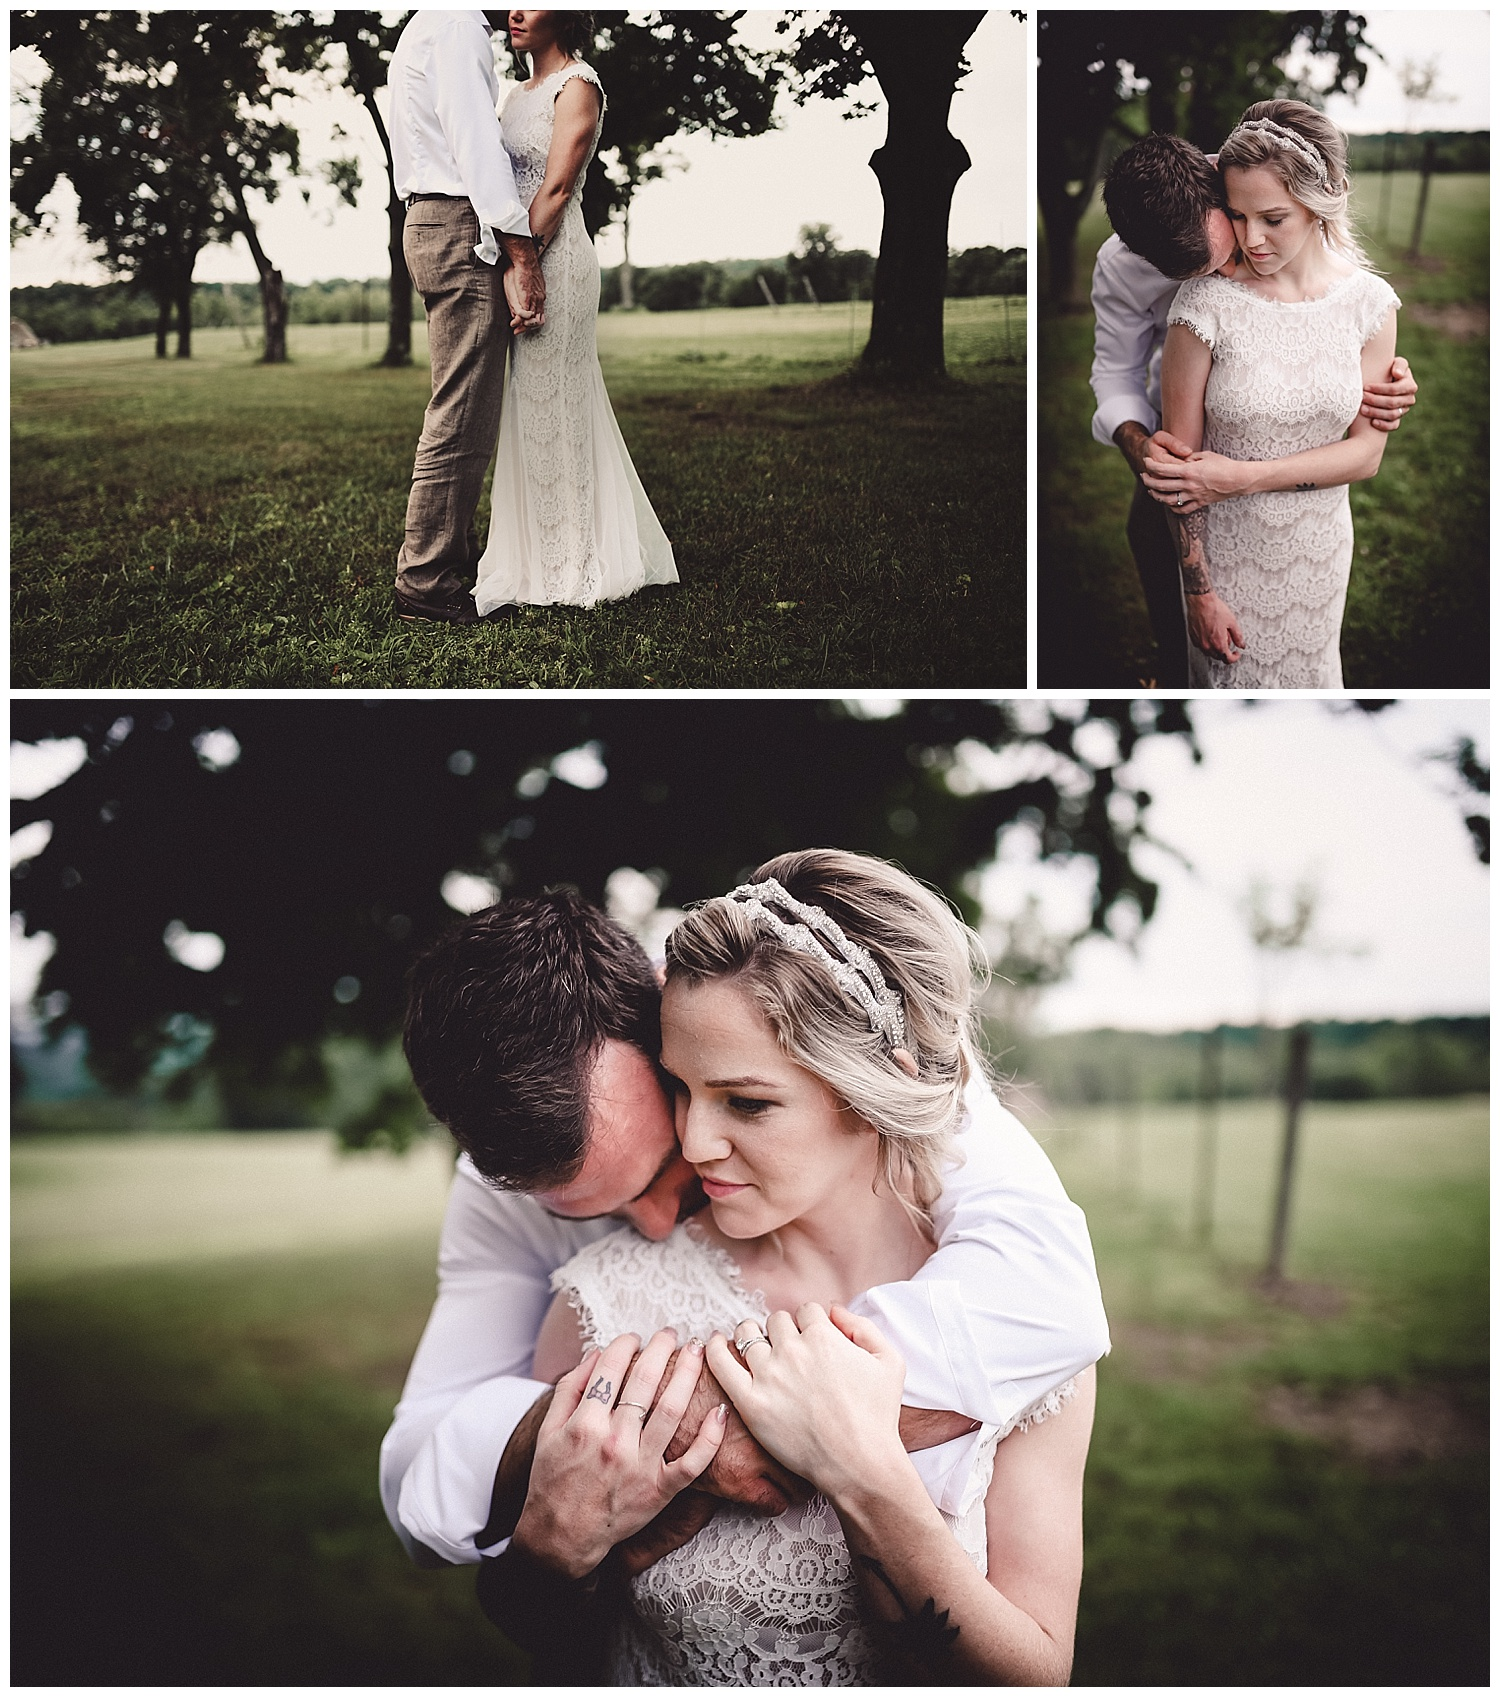 Wedding Photographer in Lewisburg PA NEPA at Tolino Vineyards in Bangor PA